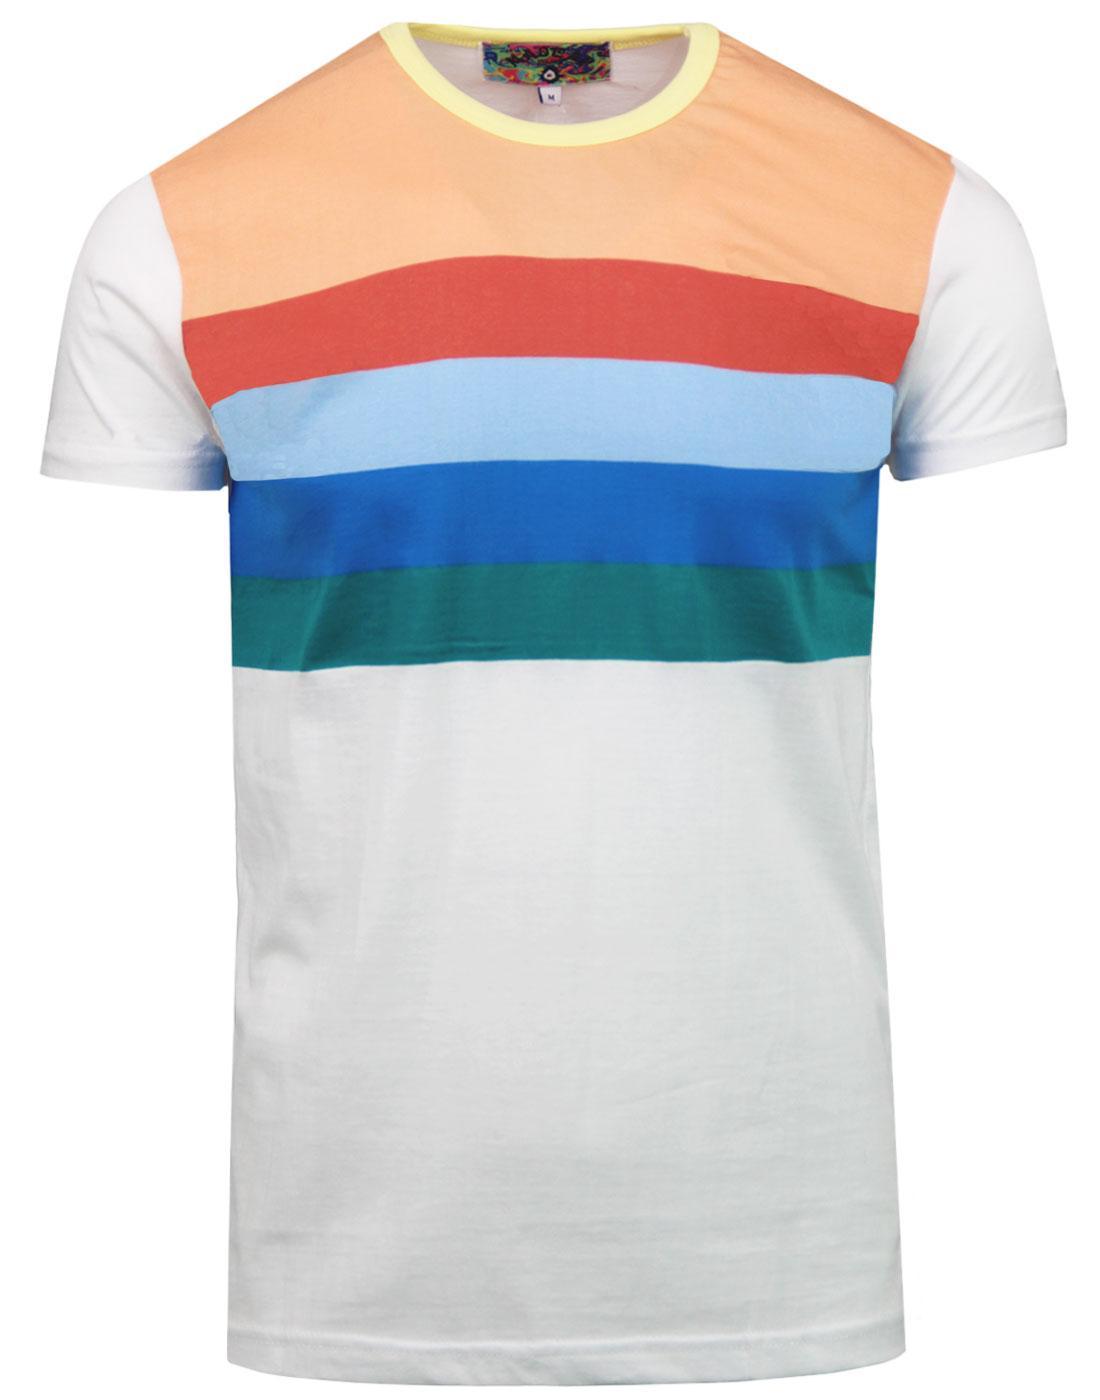 madcap england titan retro 70s rainbow stripe tee